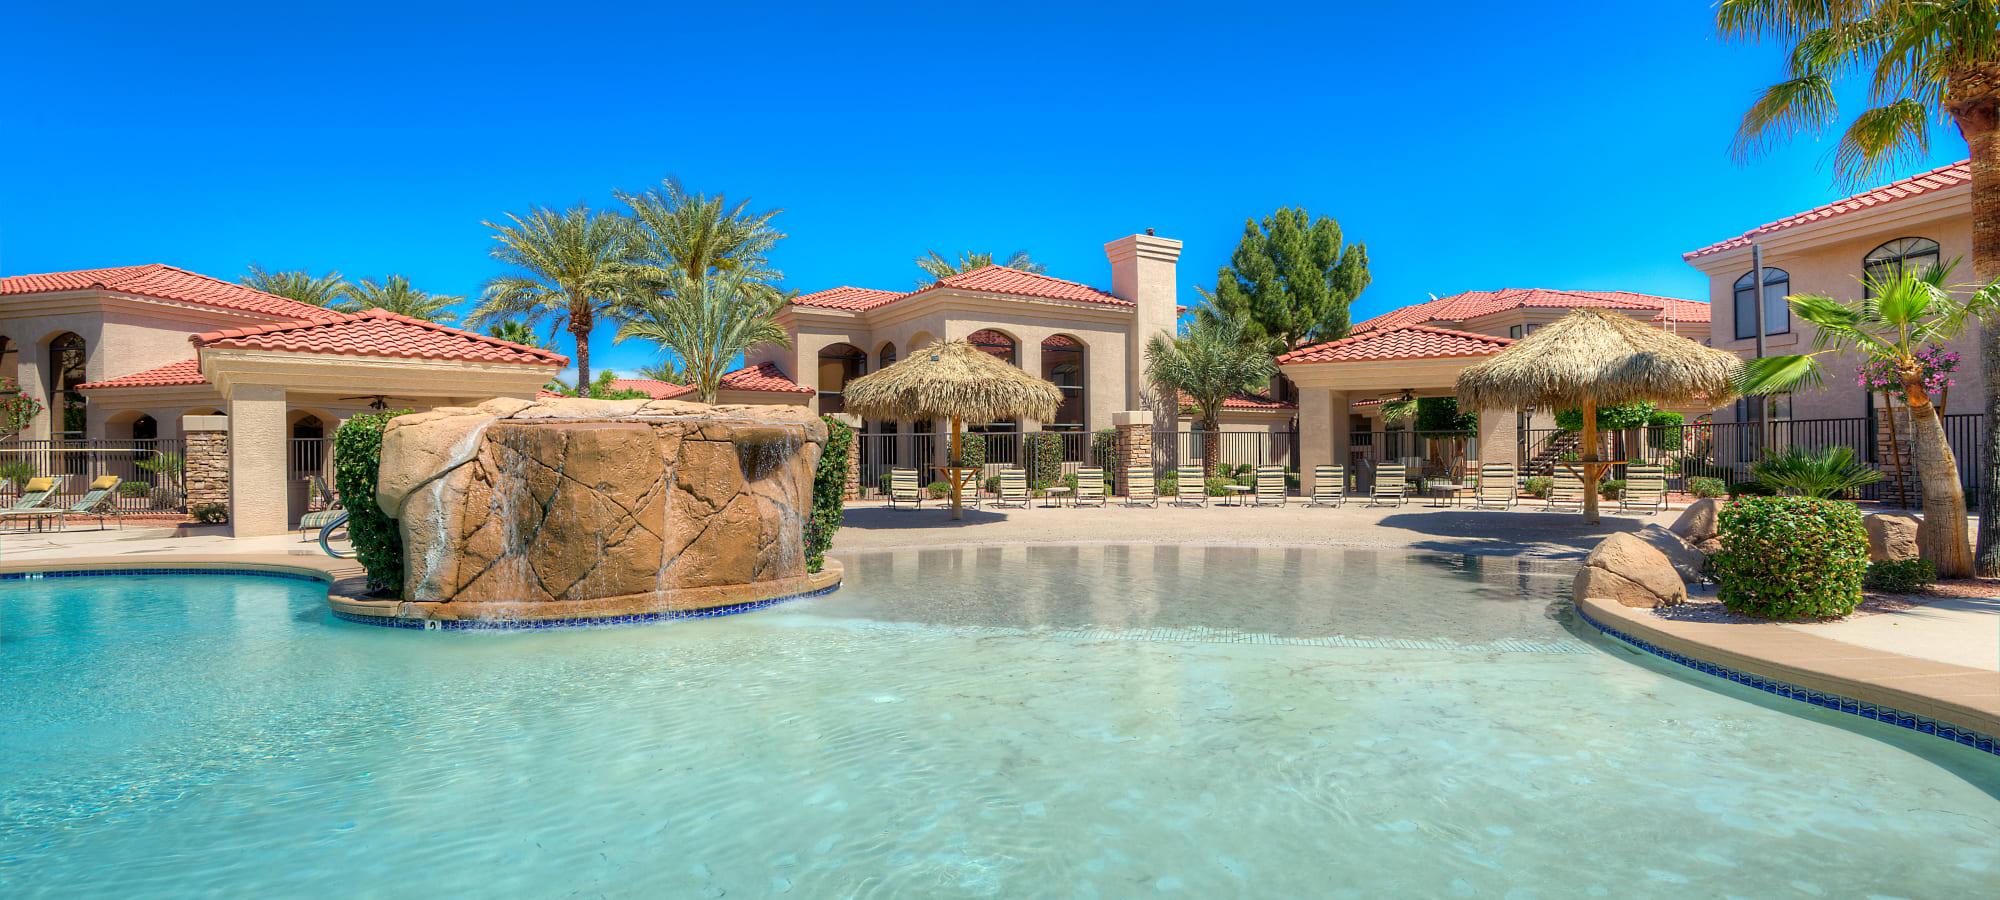 Tropical-style swimming pool at San Lagos in Glendale, Arizona